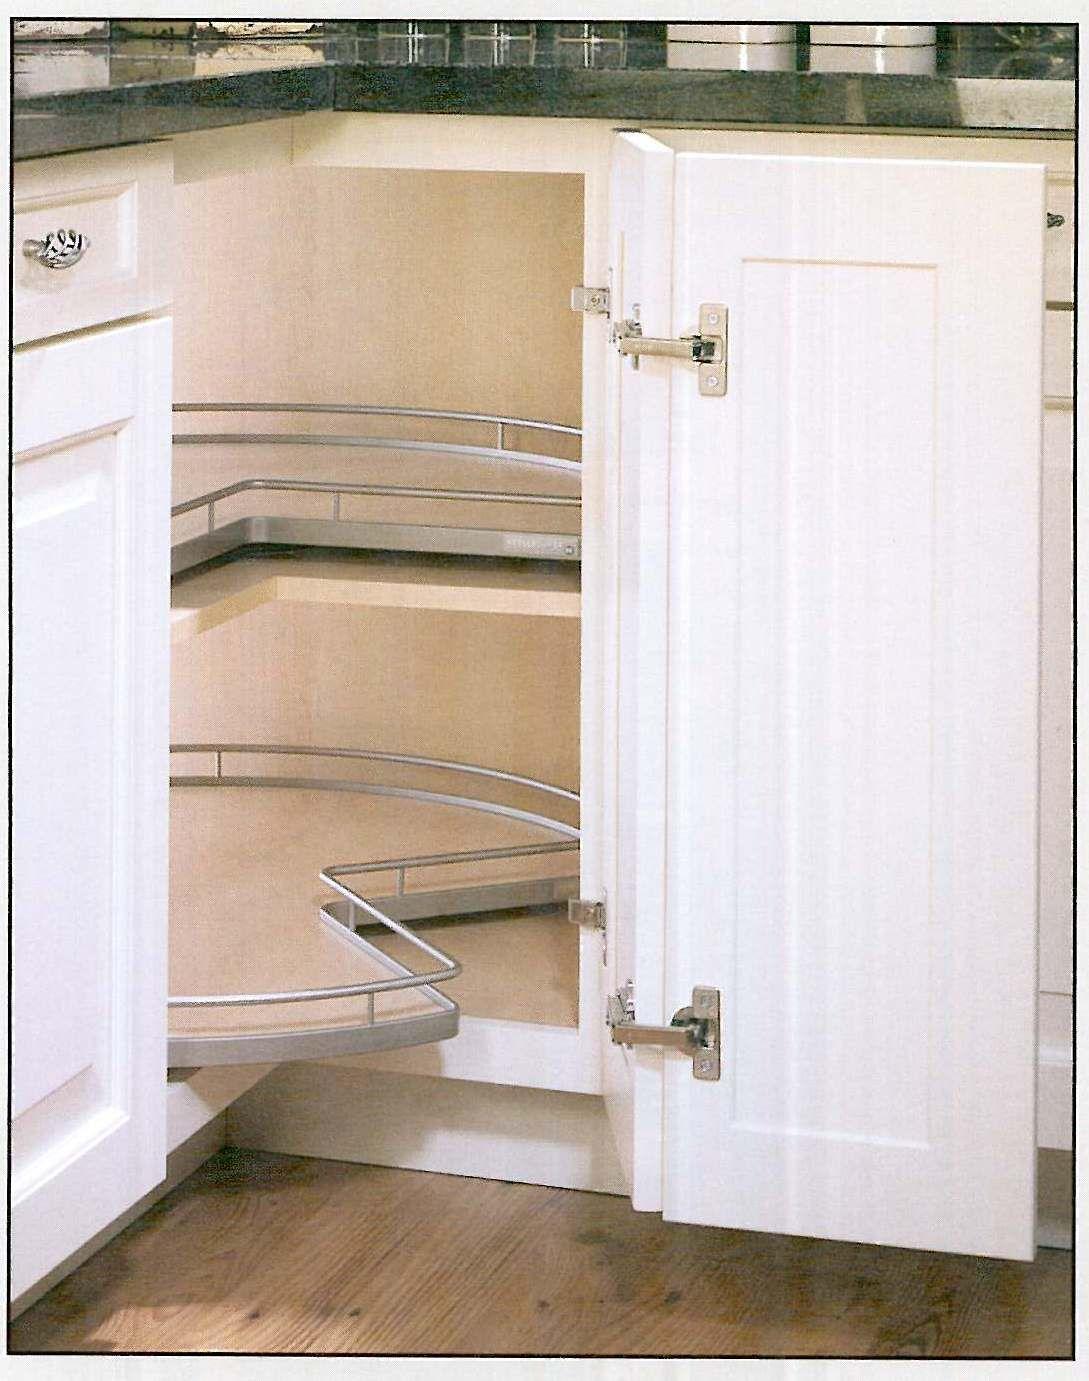 lazy susan cabinets kitchen cabinet design lazy susan on kitchen organization lazy susan id=77120